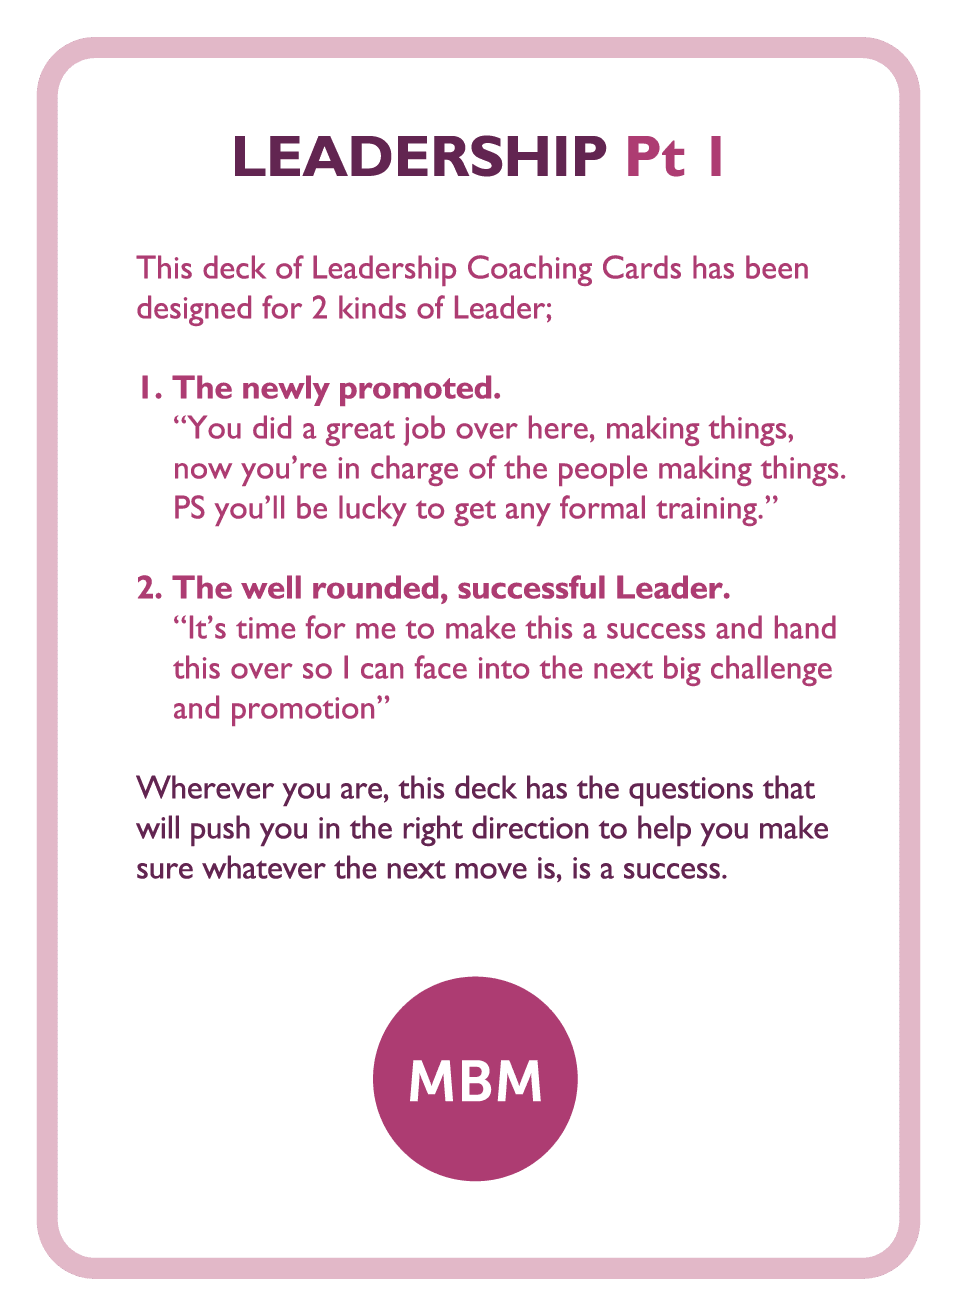 Coaching card titled Leadership Pt 1